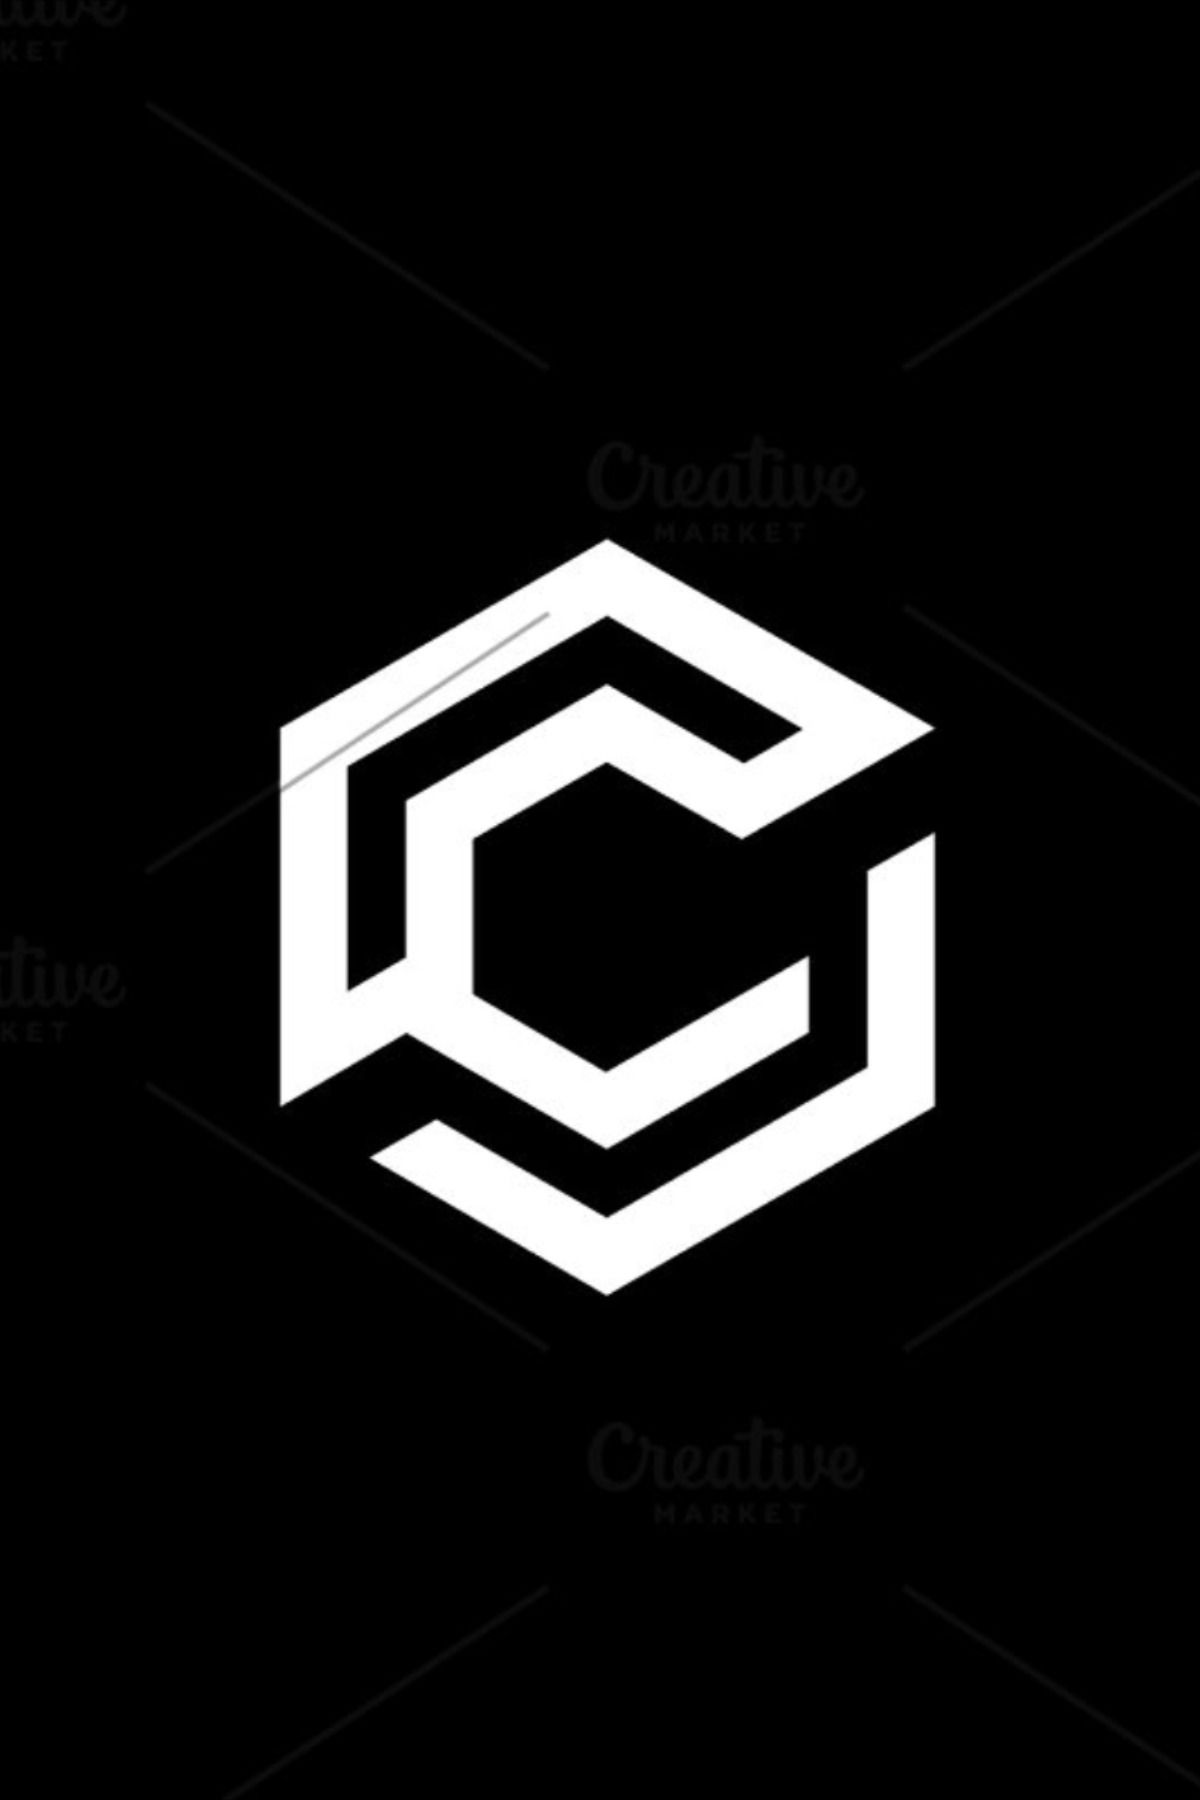 Logo Huruf G Keren : huruf, keren, Abstract, Letter, Vector, Desain, Logo,, Lukisan, Huruf,, Keren